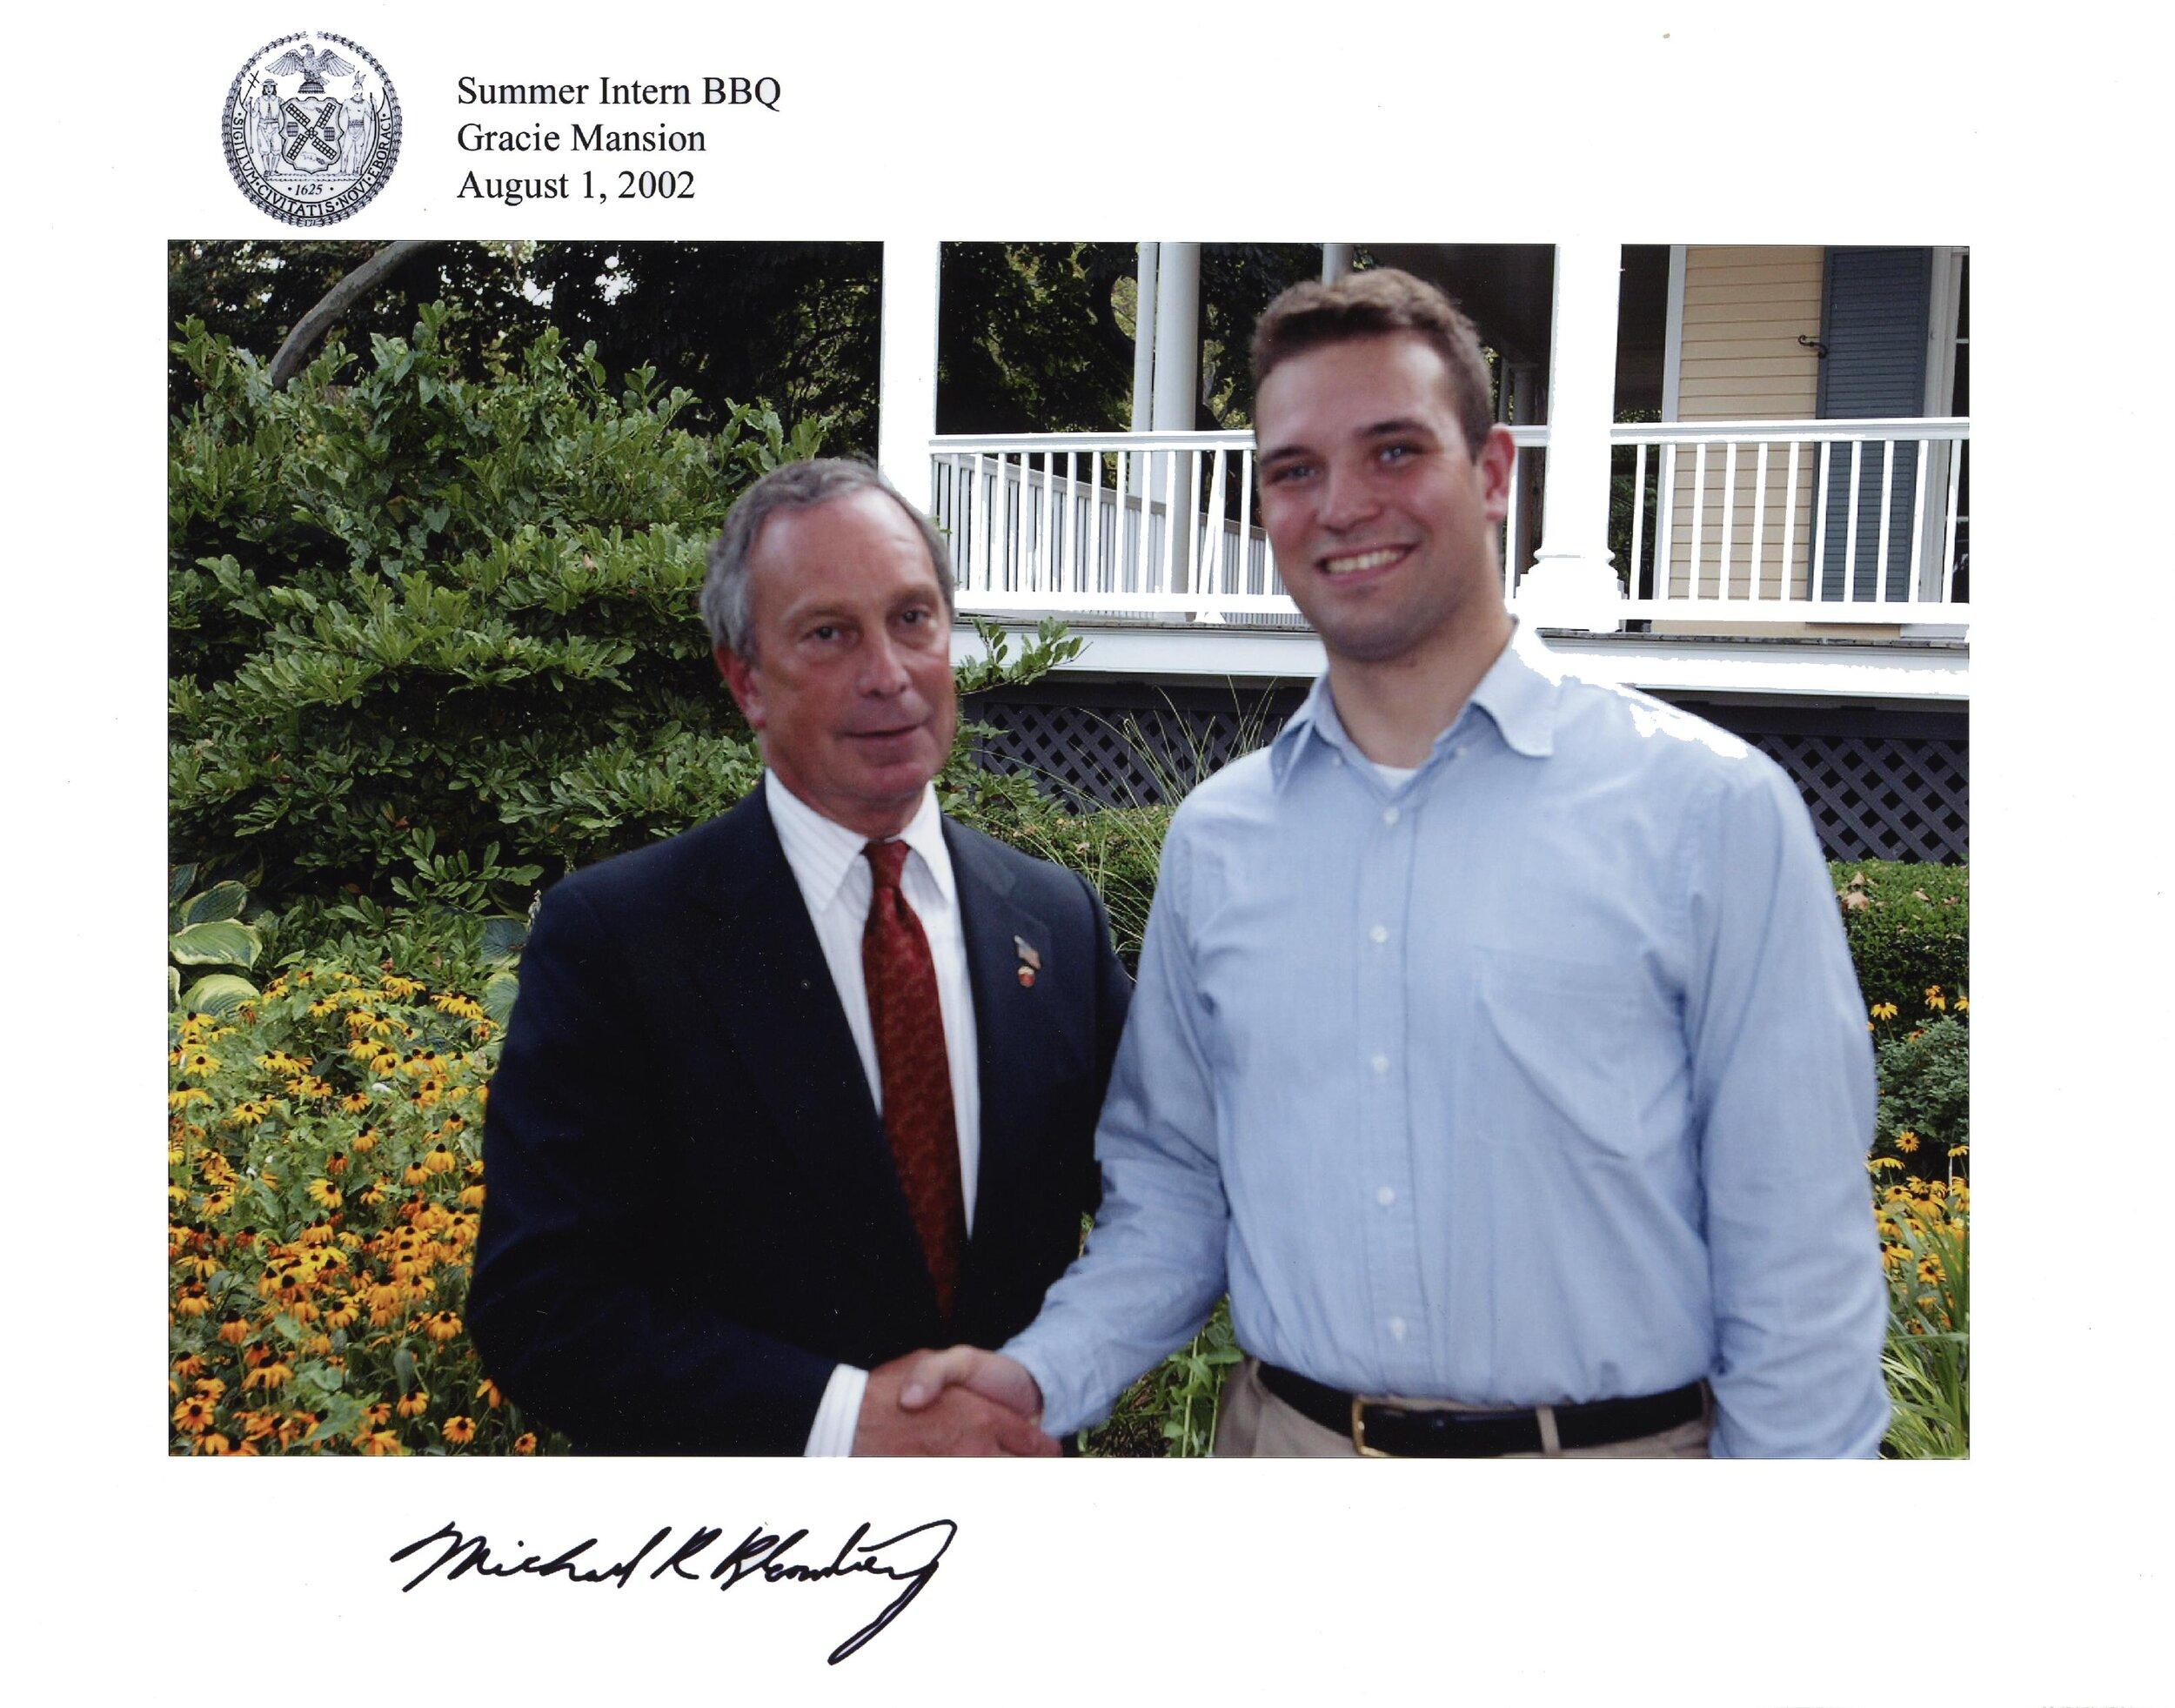 2002, 08,01; Gracie Mansion; Bloomberg, JH; 5391.JPG